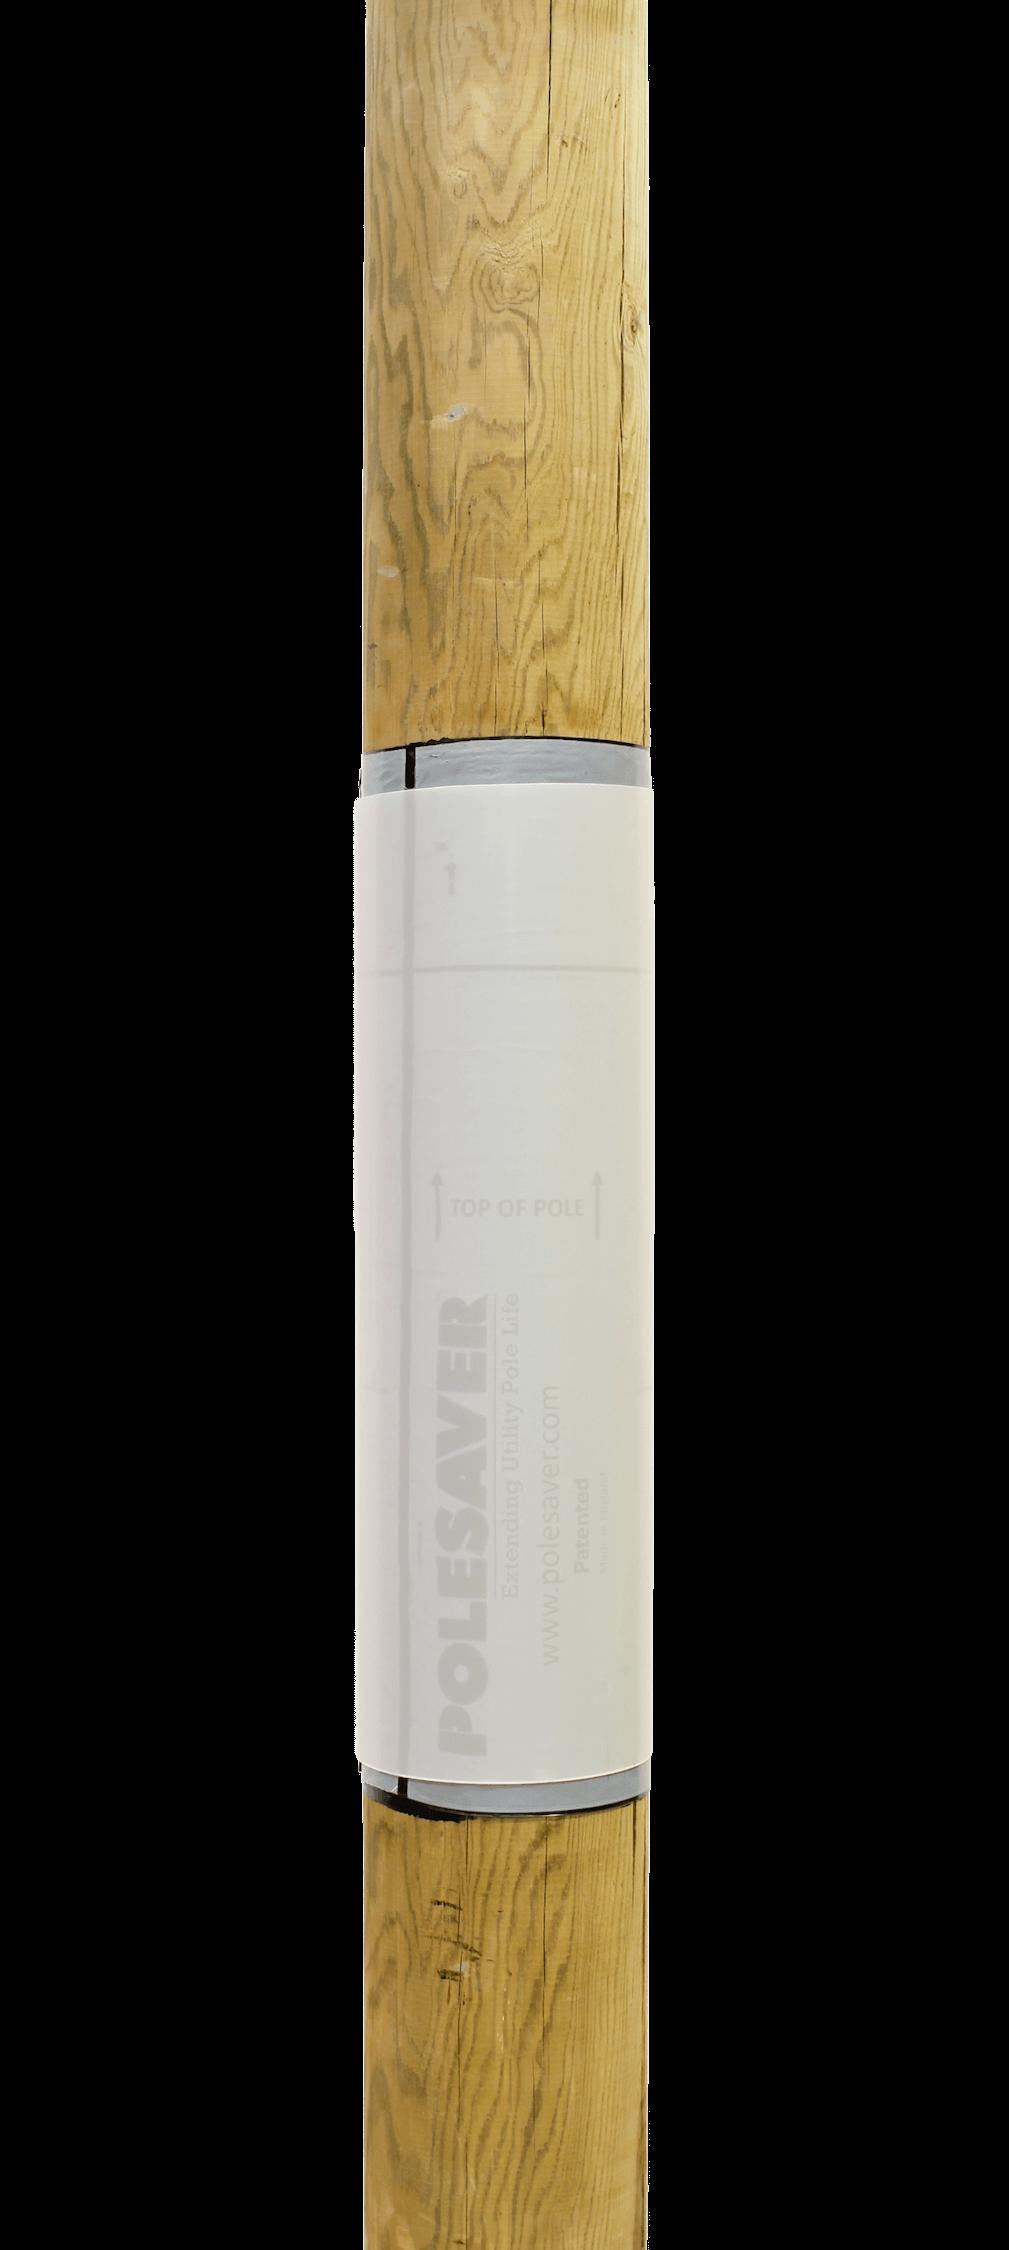 Polesaver Plus shown mounted on a wooden utility pole